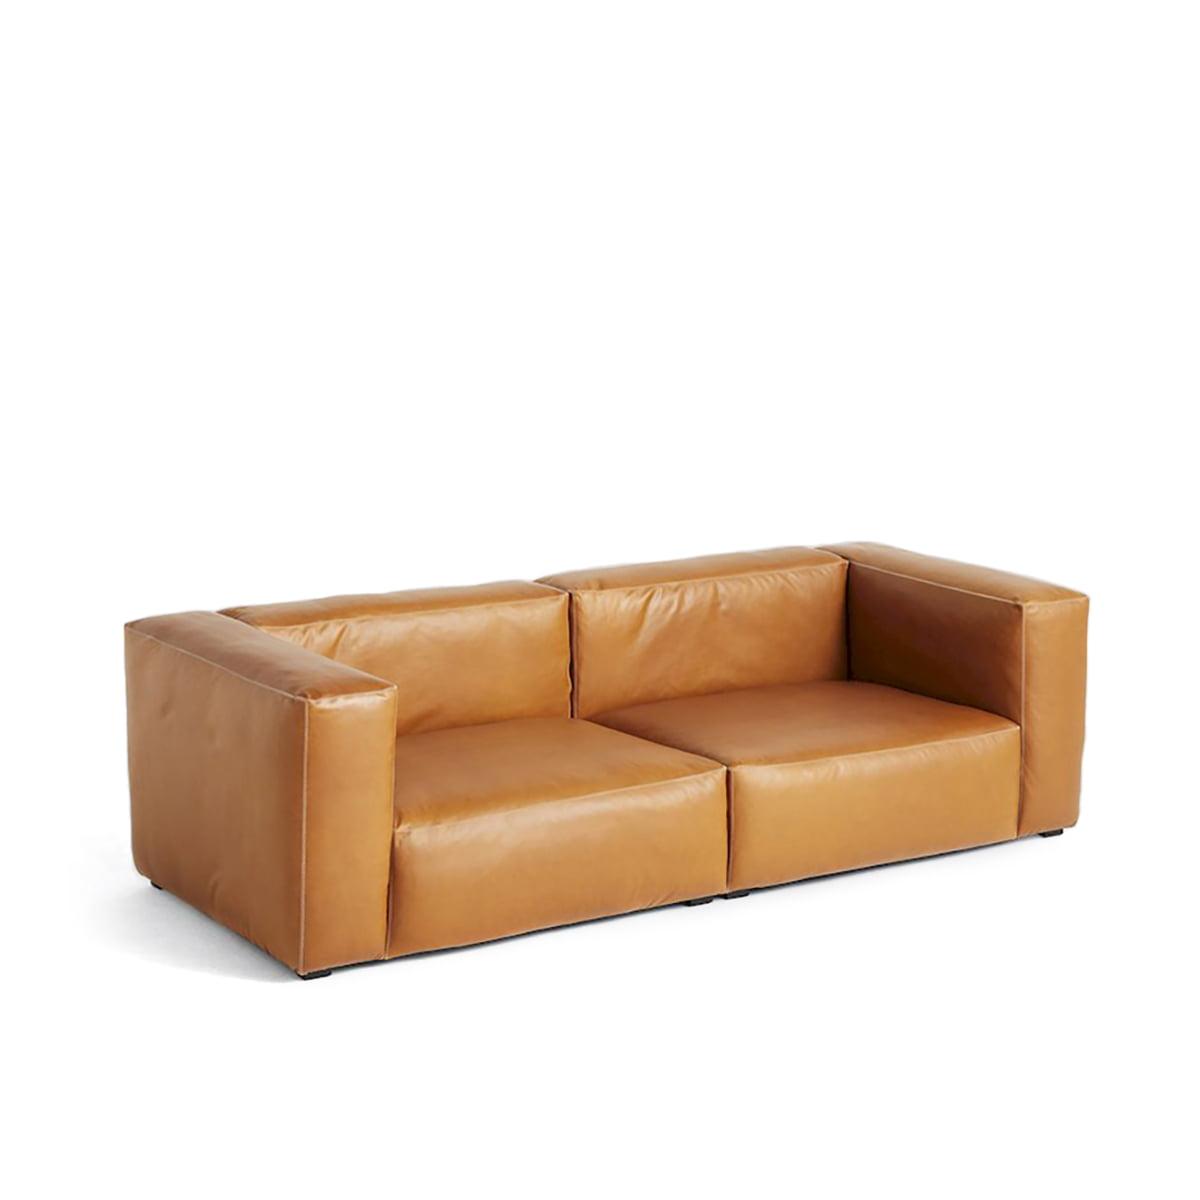 cognac leder 2 3 sitzer sofas online kaufen m bel suchmaschine. Black Bedroom Furniture Sets. Home Design Ideas